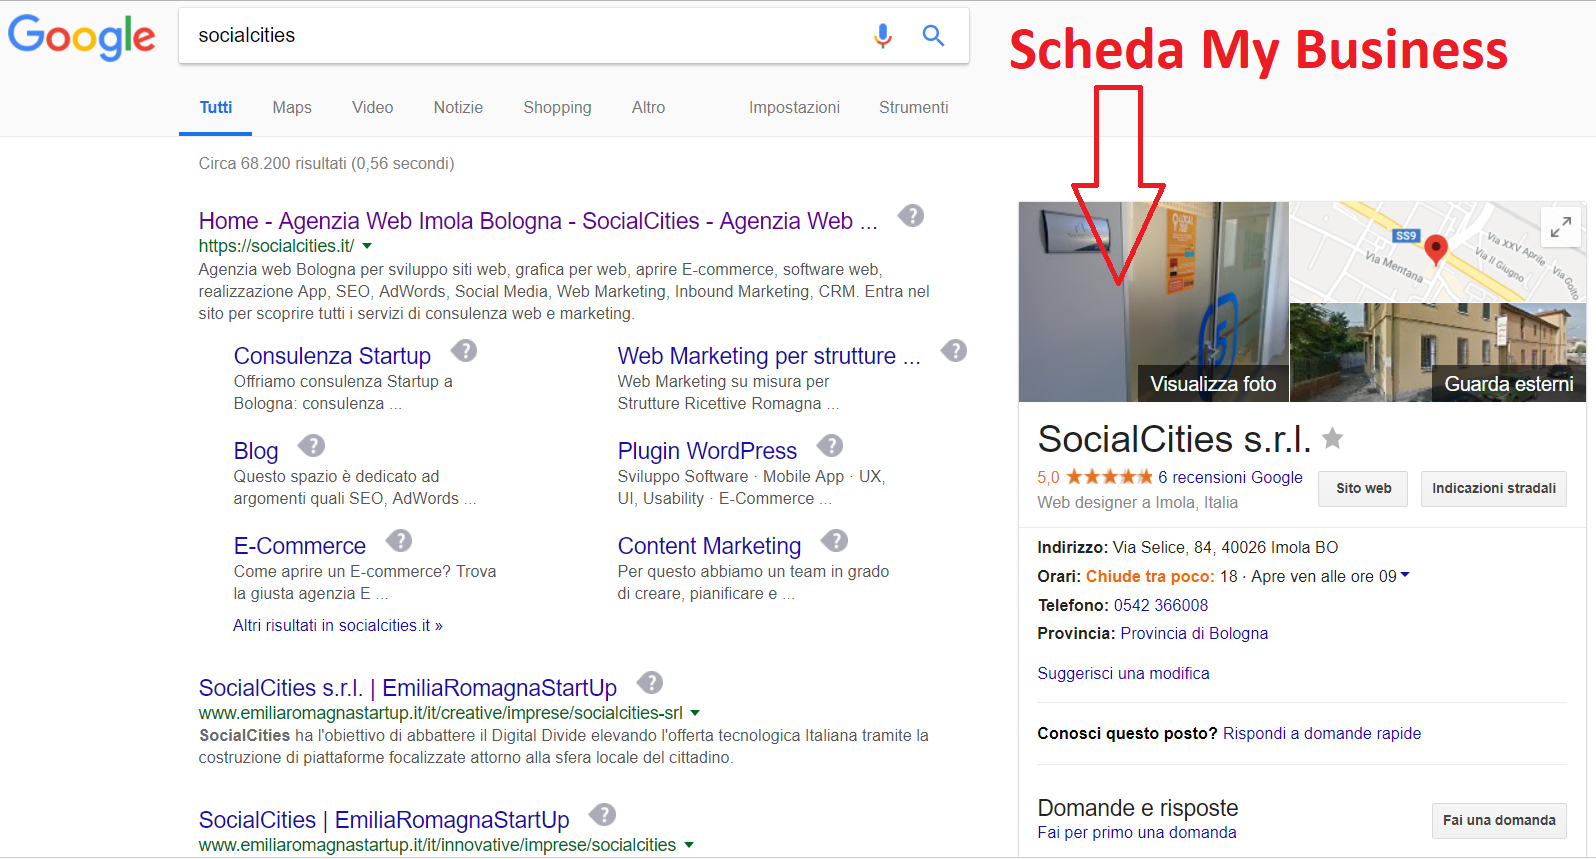 google my business liberi professionisti